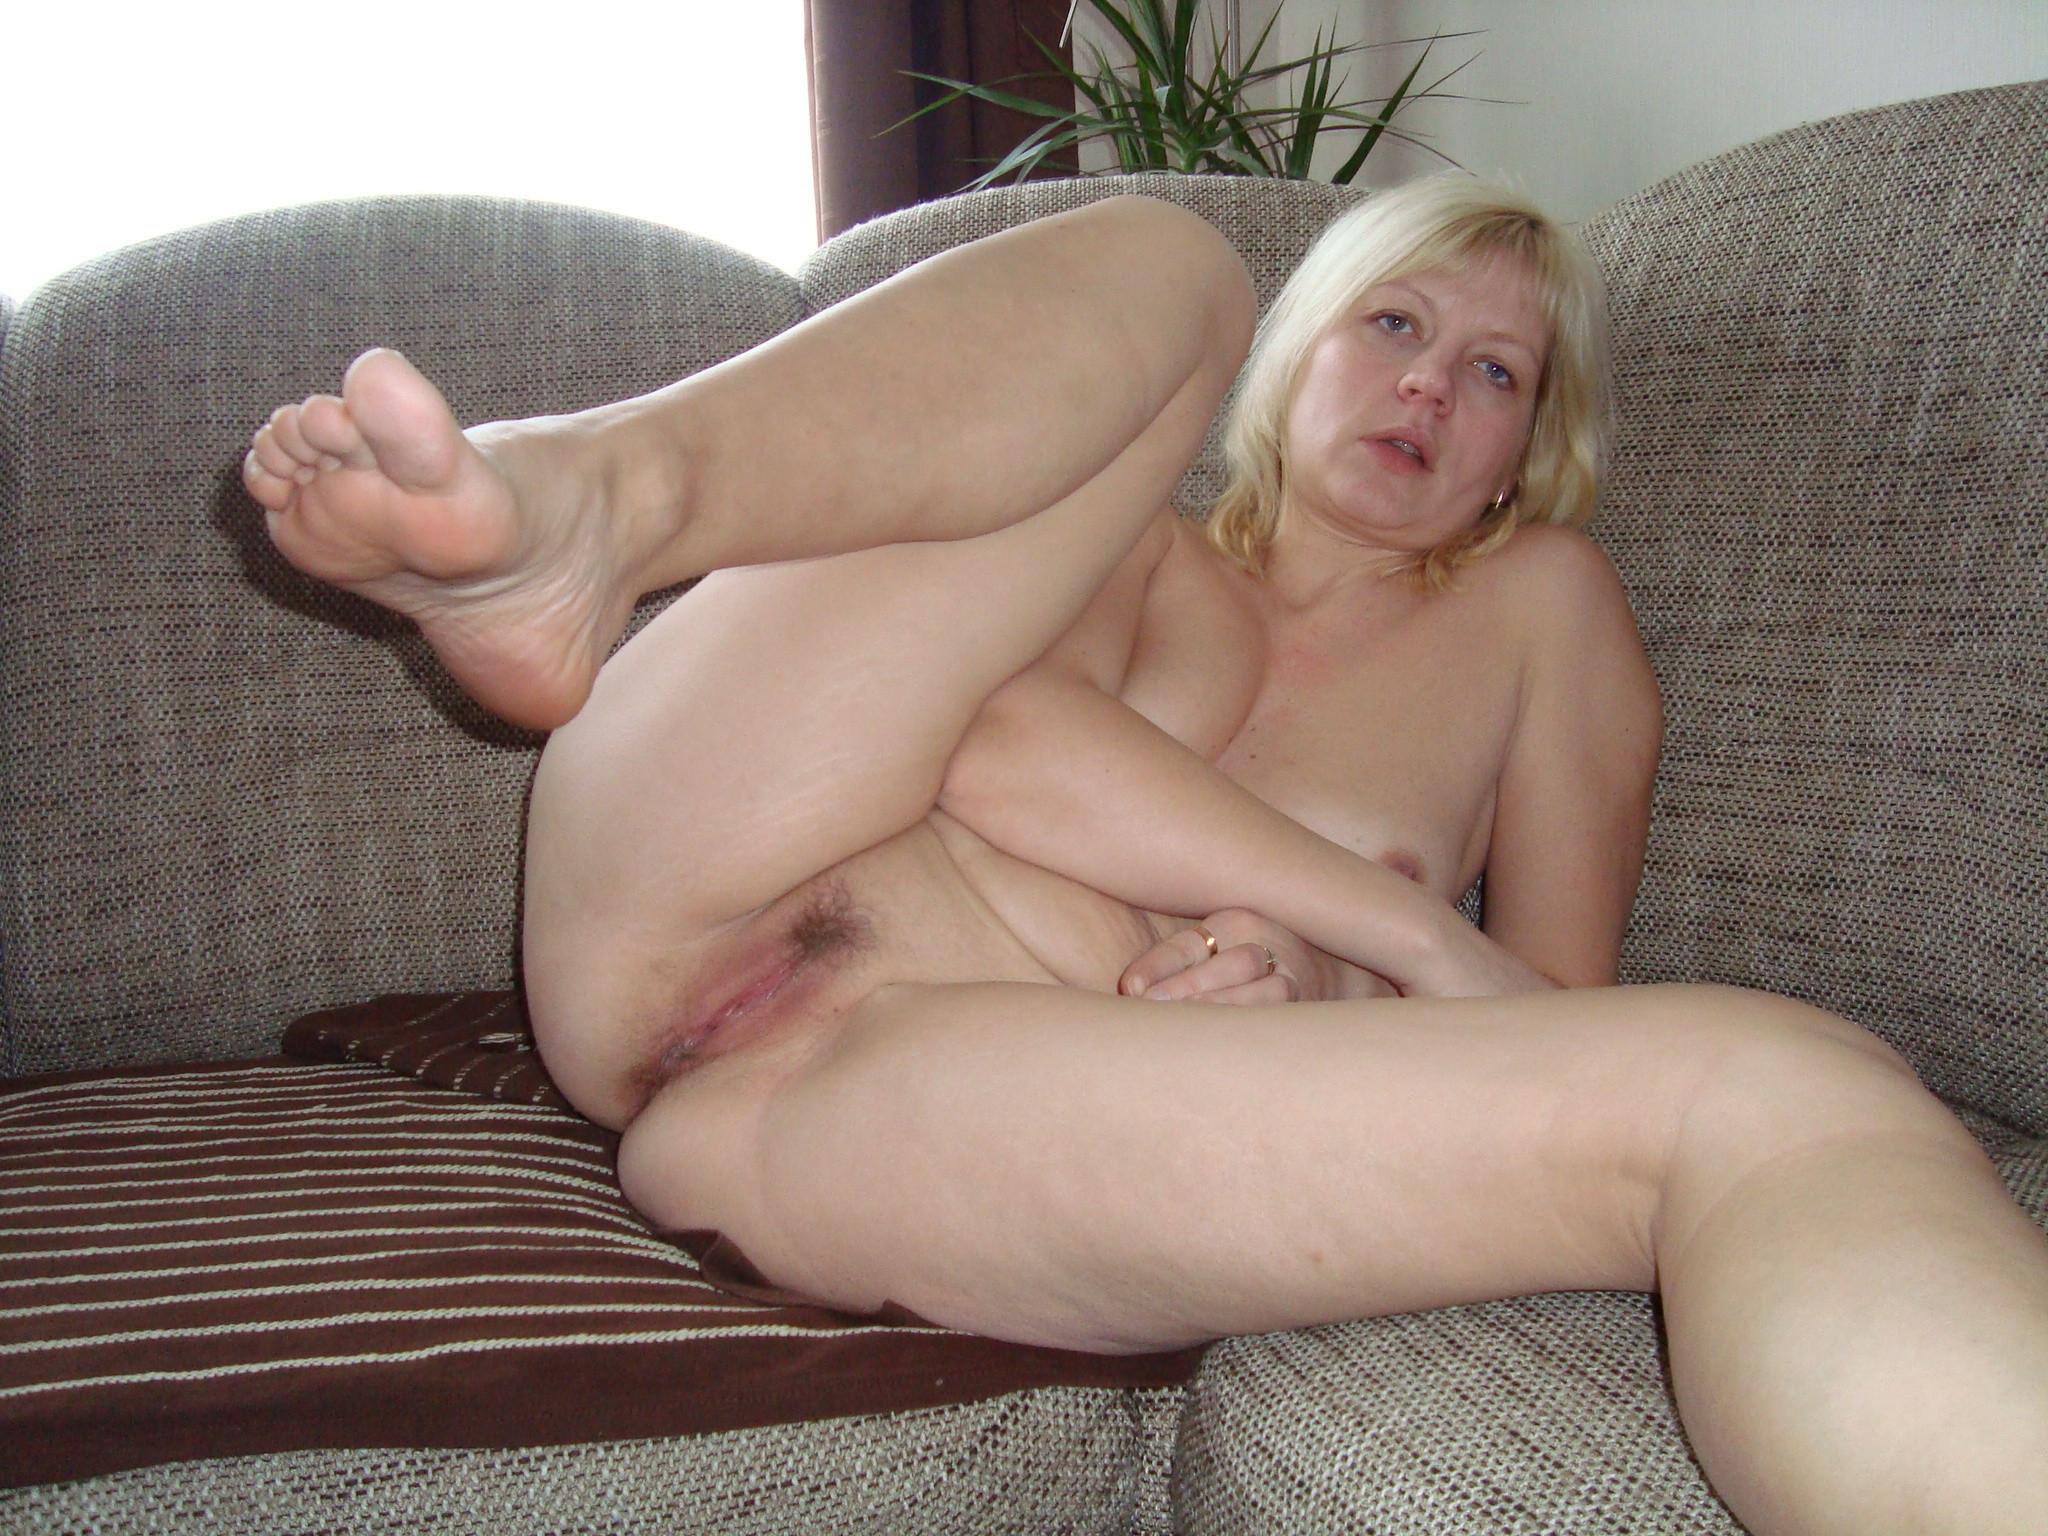 girlfriend spank photo